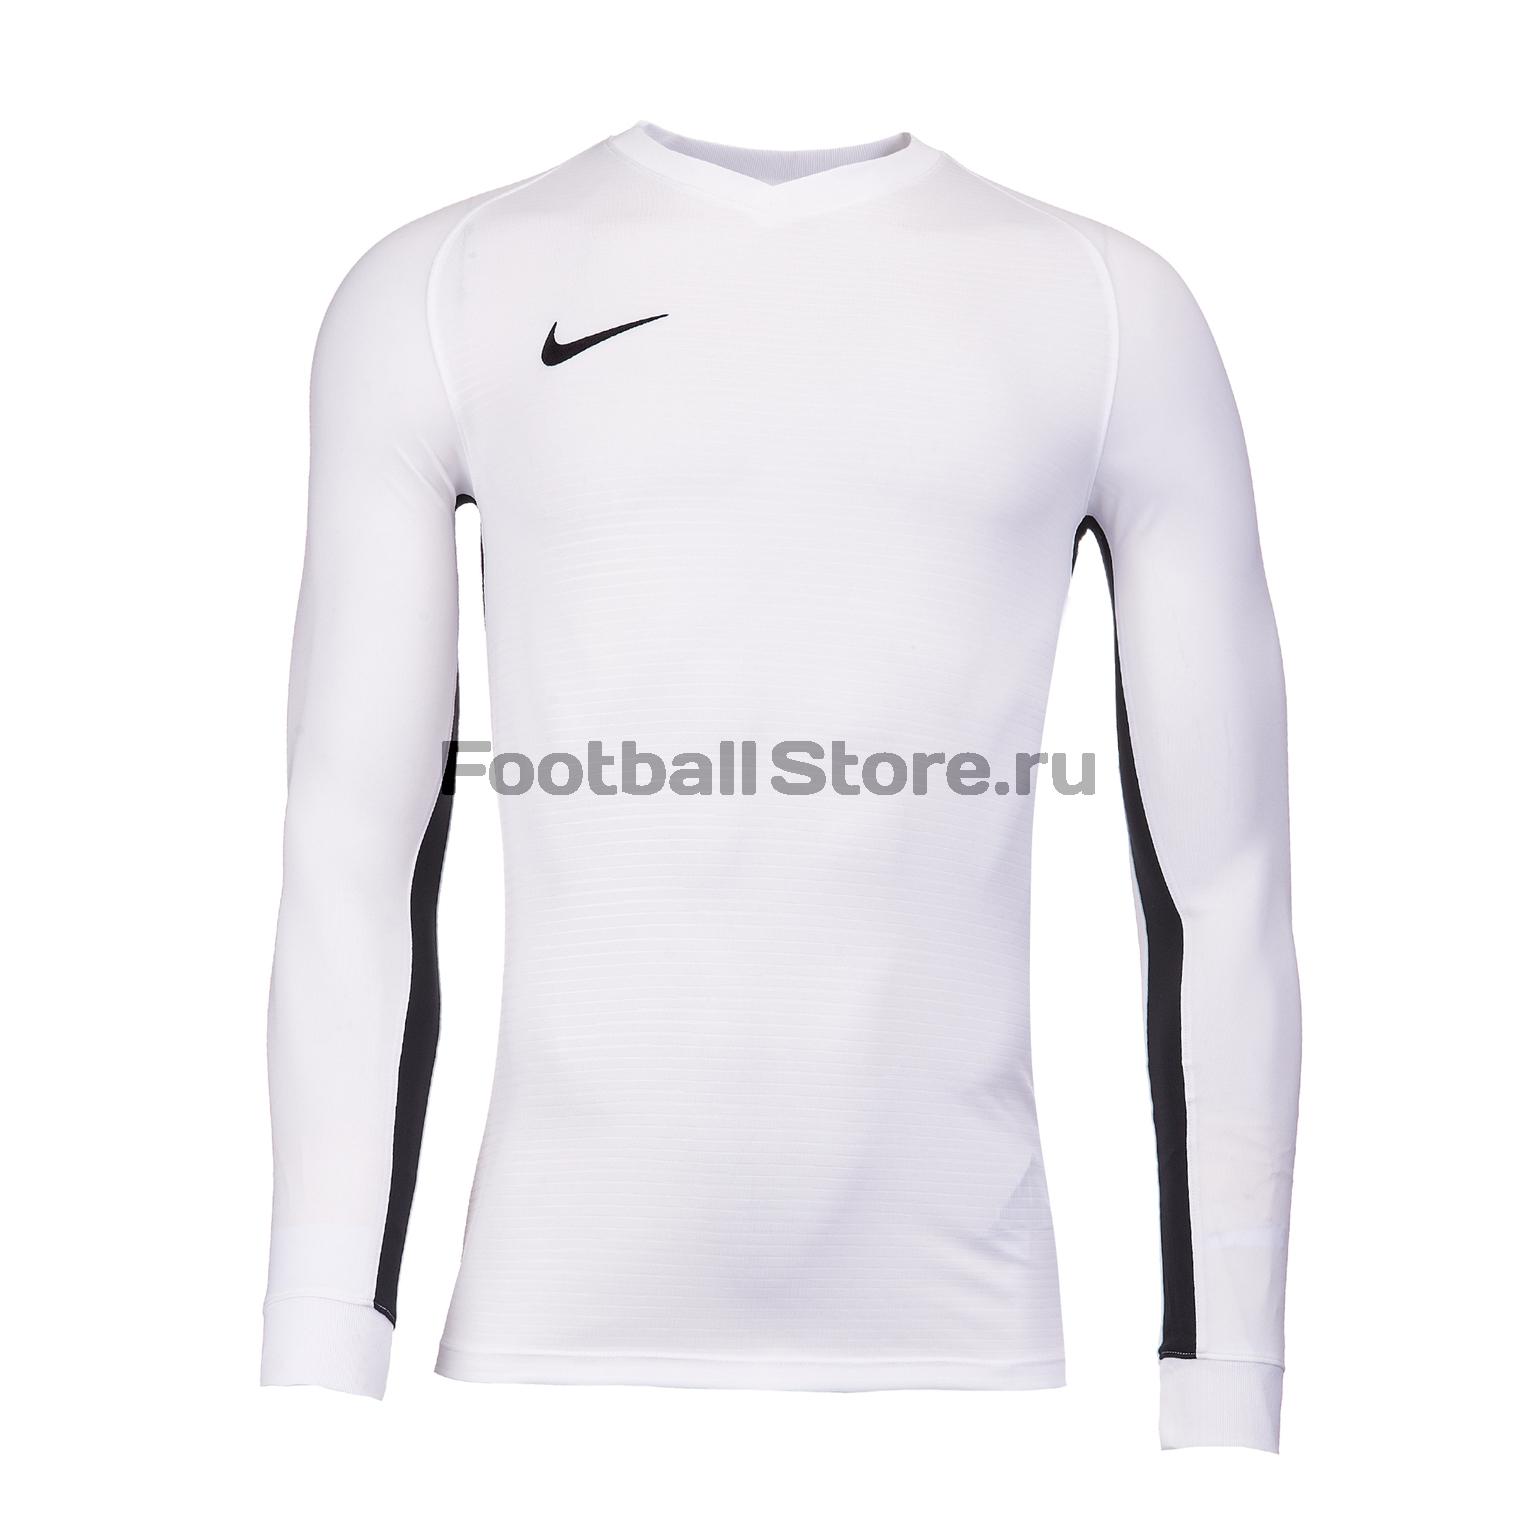 Футболка игровая Nike Dry Tiempo Prem JSY LS 894248-100 футболка игровая nike dry tiempo prem jsy ss 894230 010